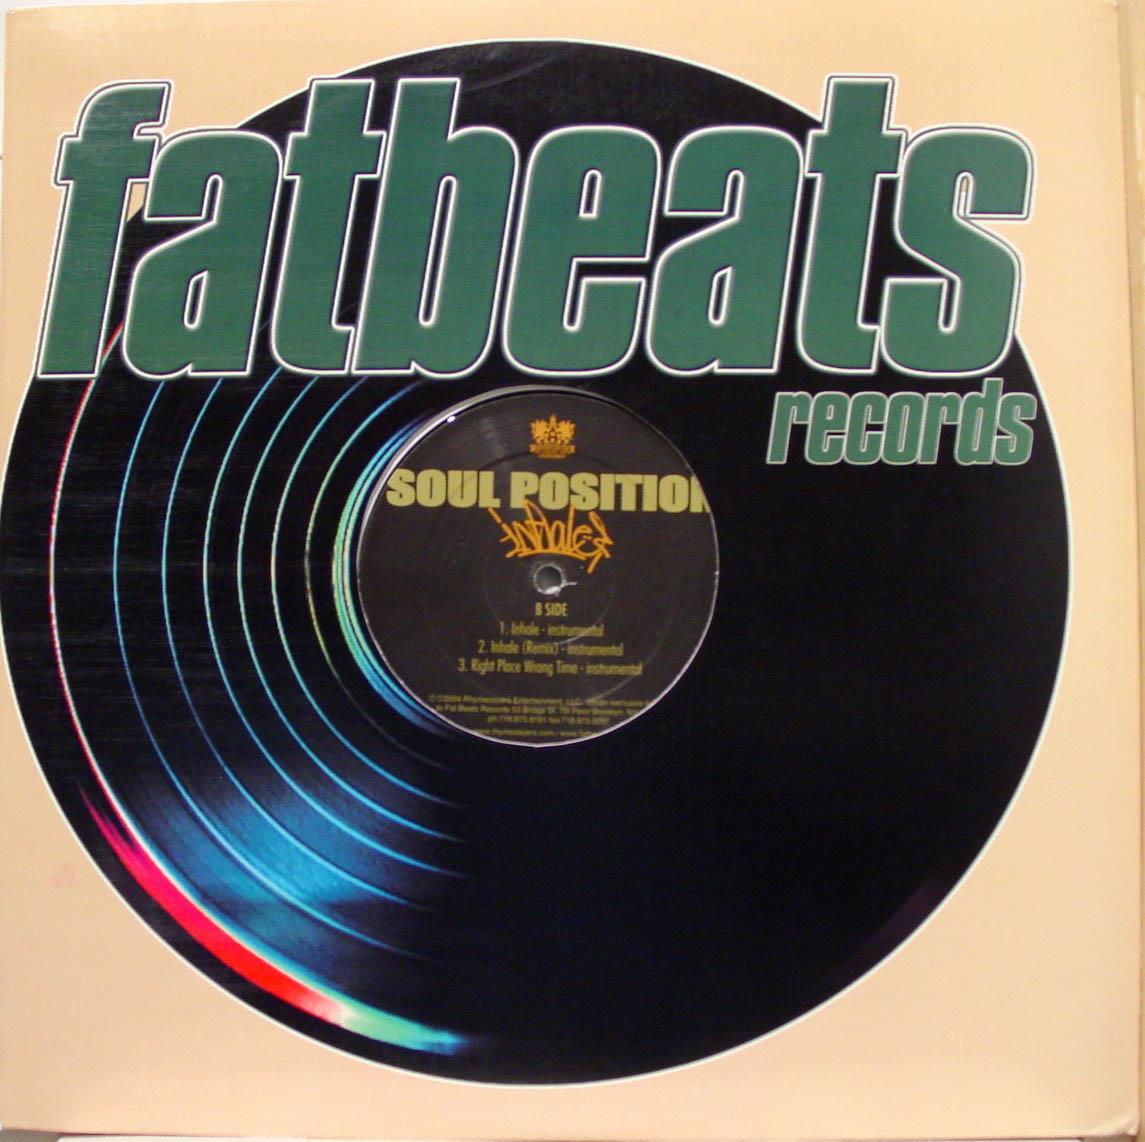 "SOUL POSITION - Soul Position Inhale 12"" Vg+ 59123 2513 1 Vinyl 2004 Record (inhale)"